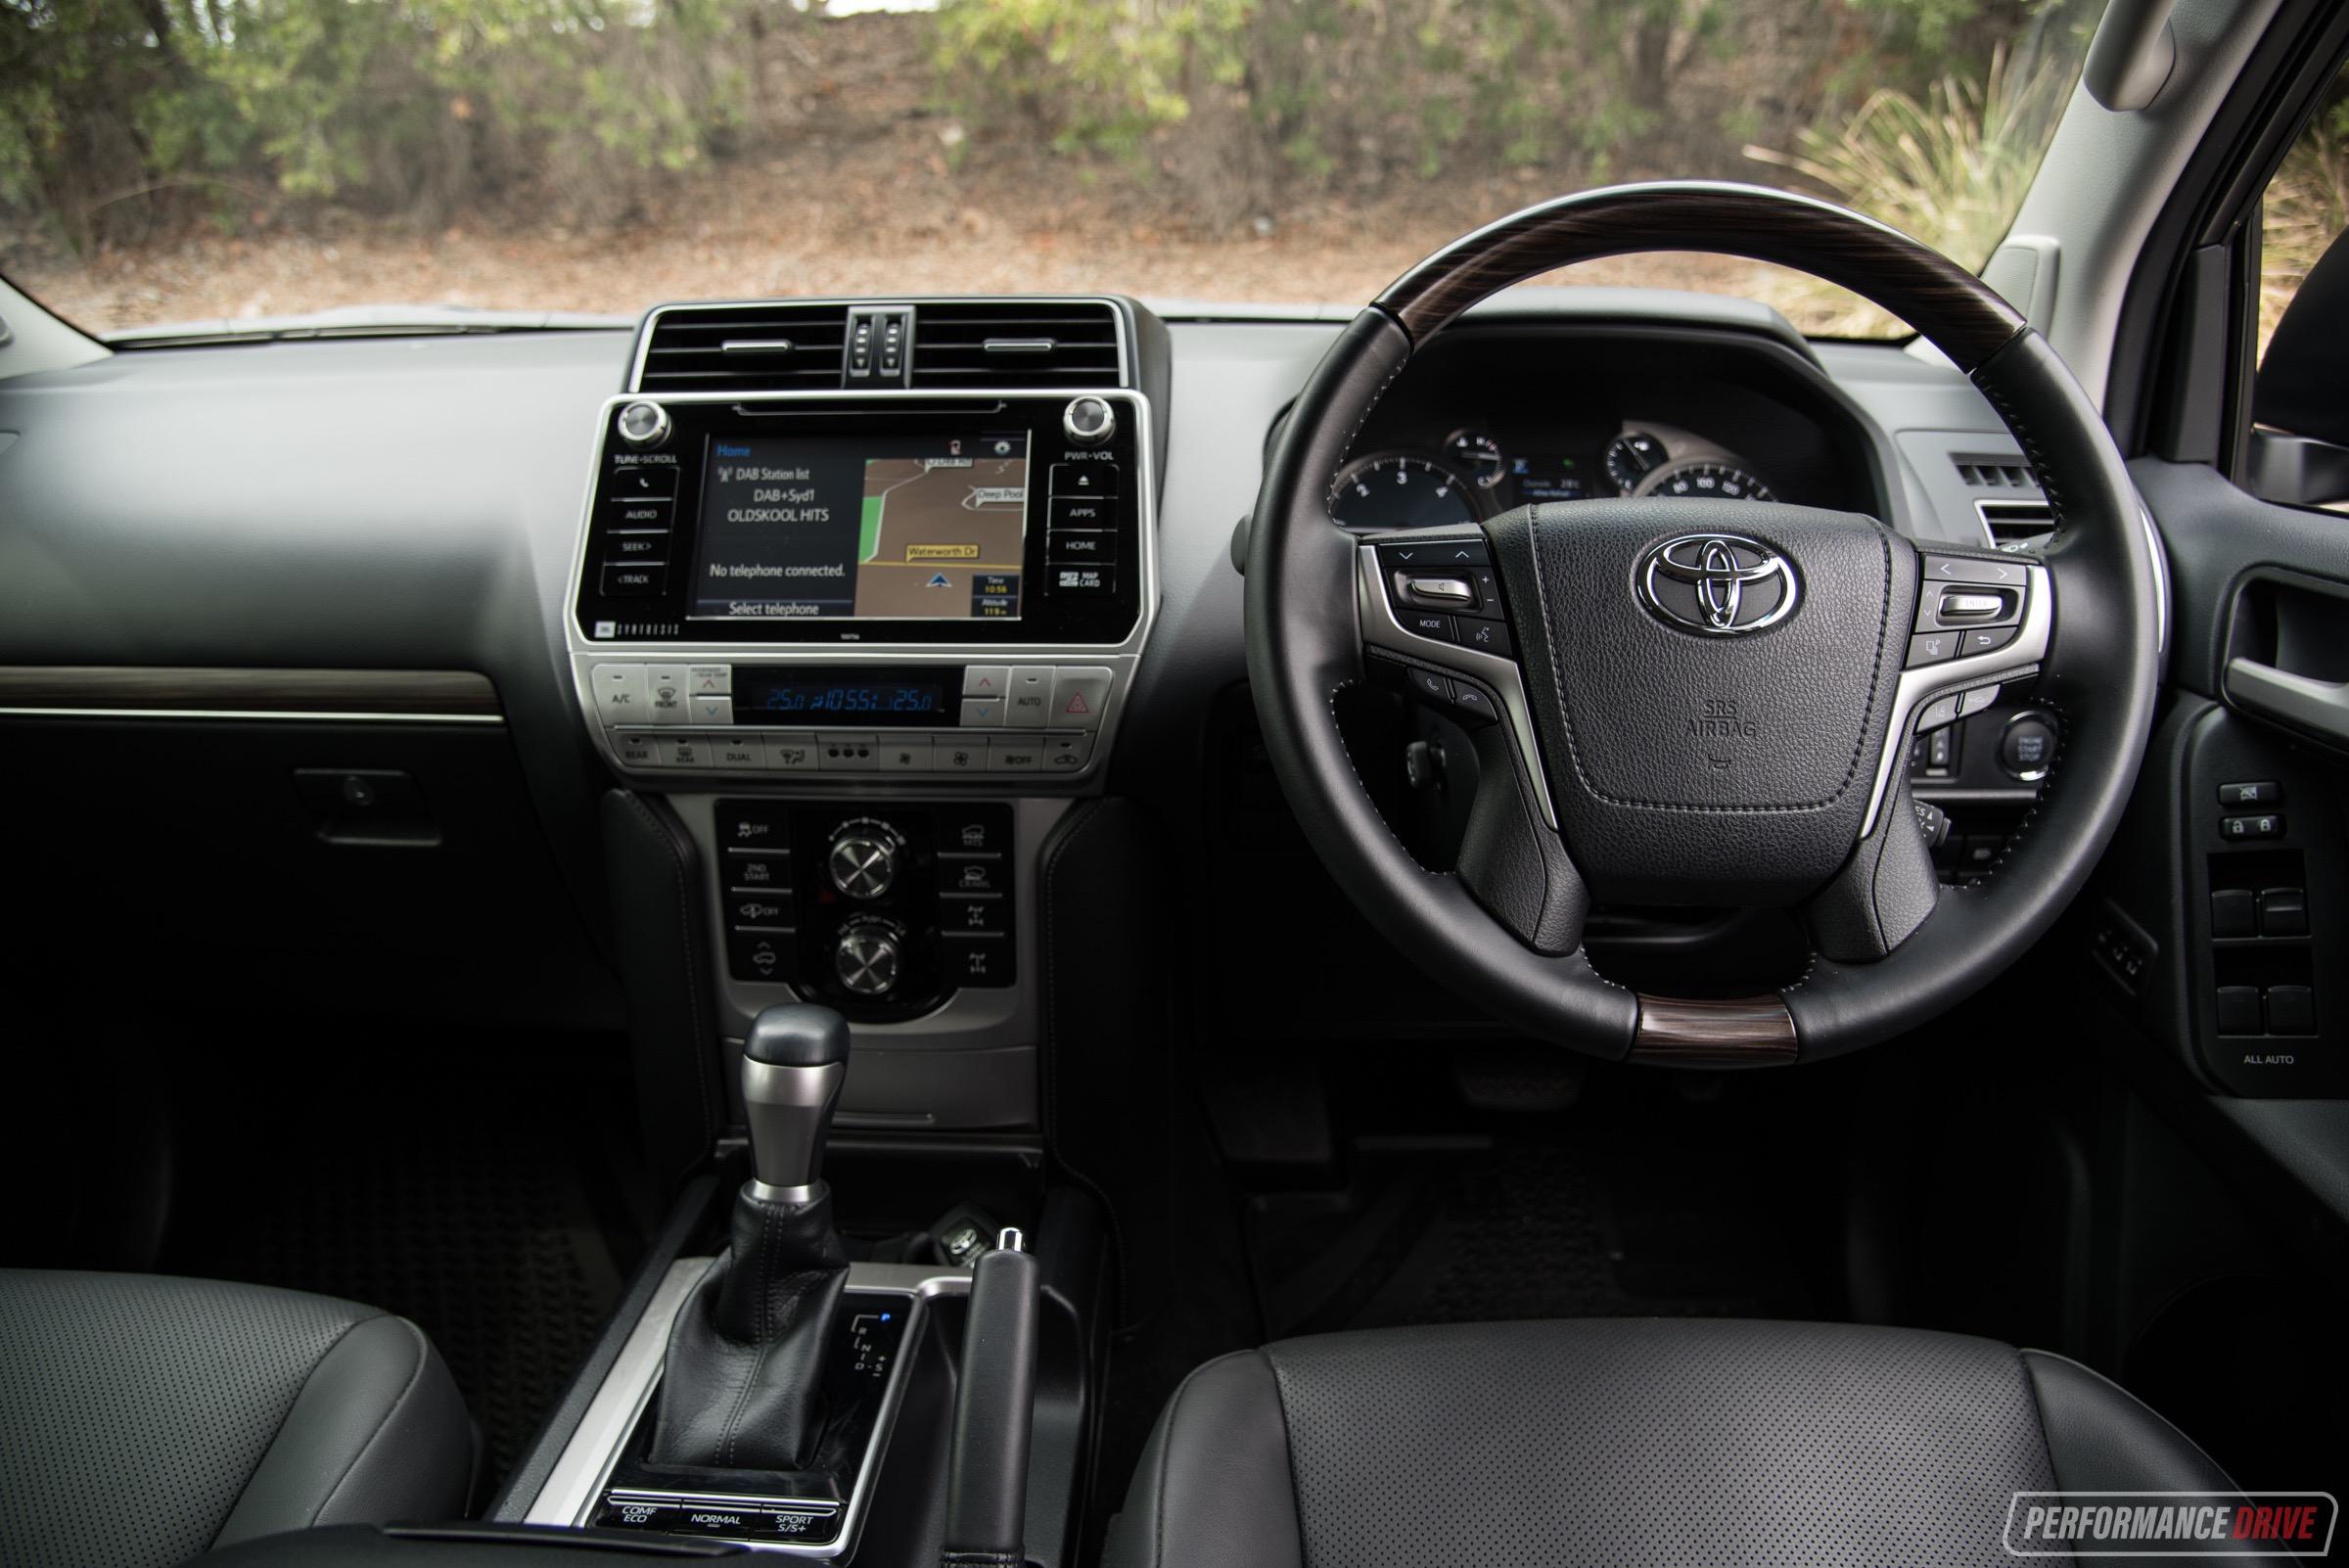 2018 Toyota LandCruiser Prado review – GX & Kakadu (video ...